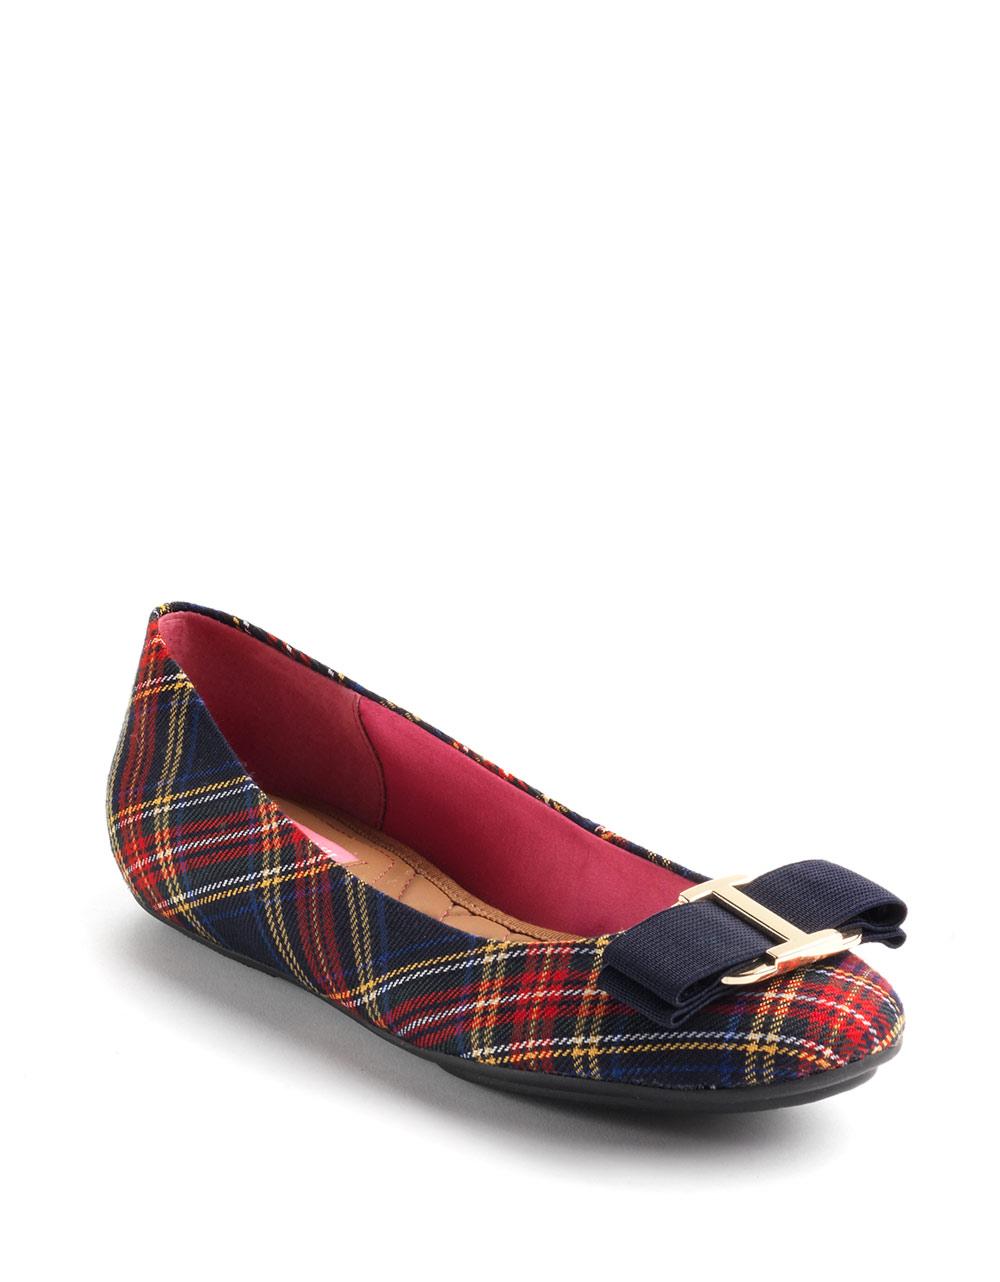 Womens Casual Plaid Shoes Blue